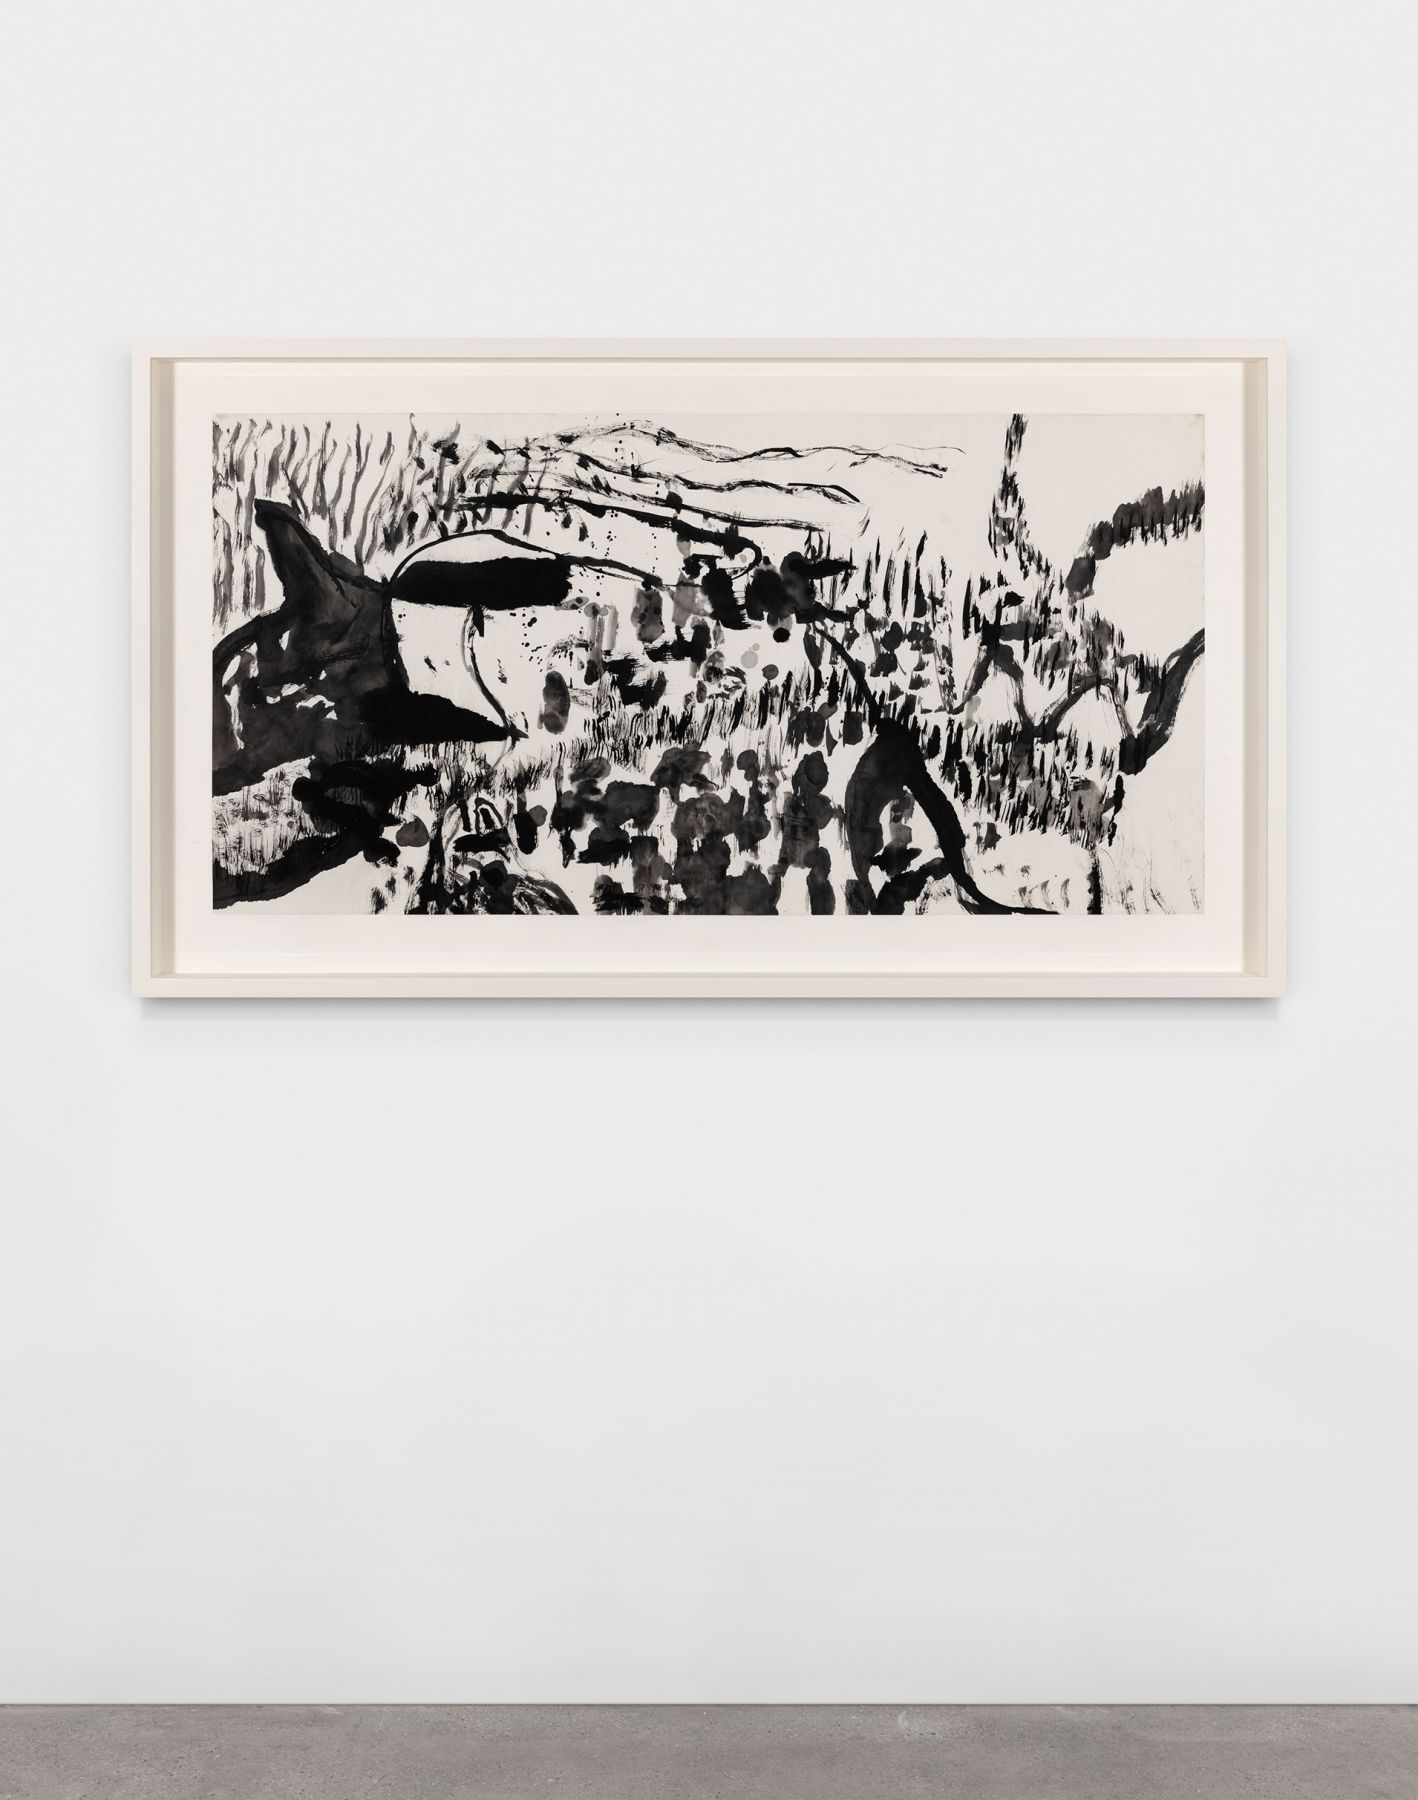 MW.40550 Untitled 2014 Landscape - figure